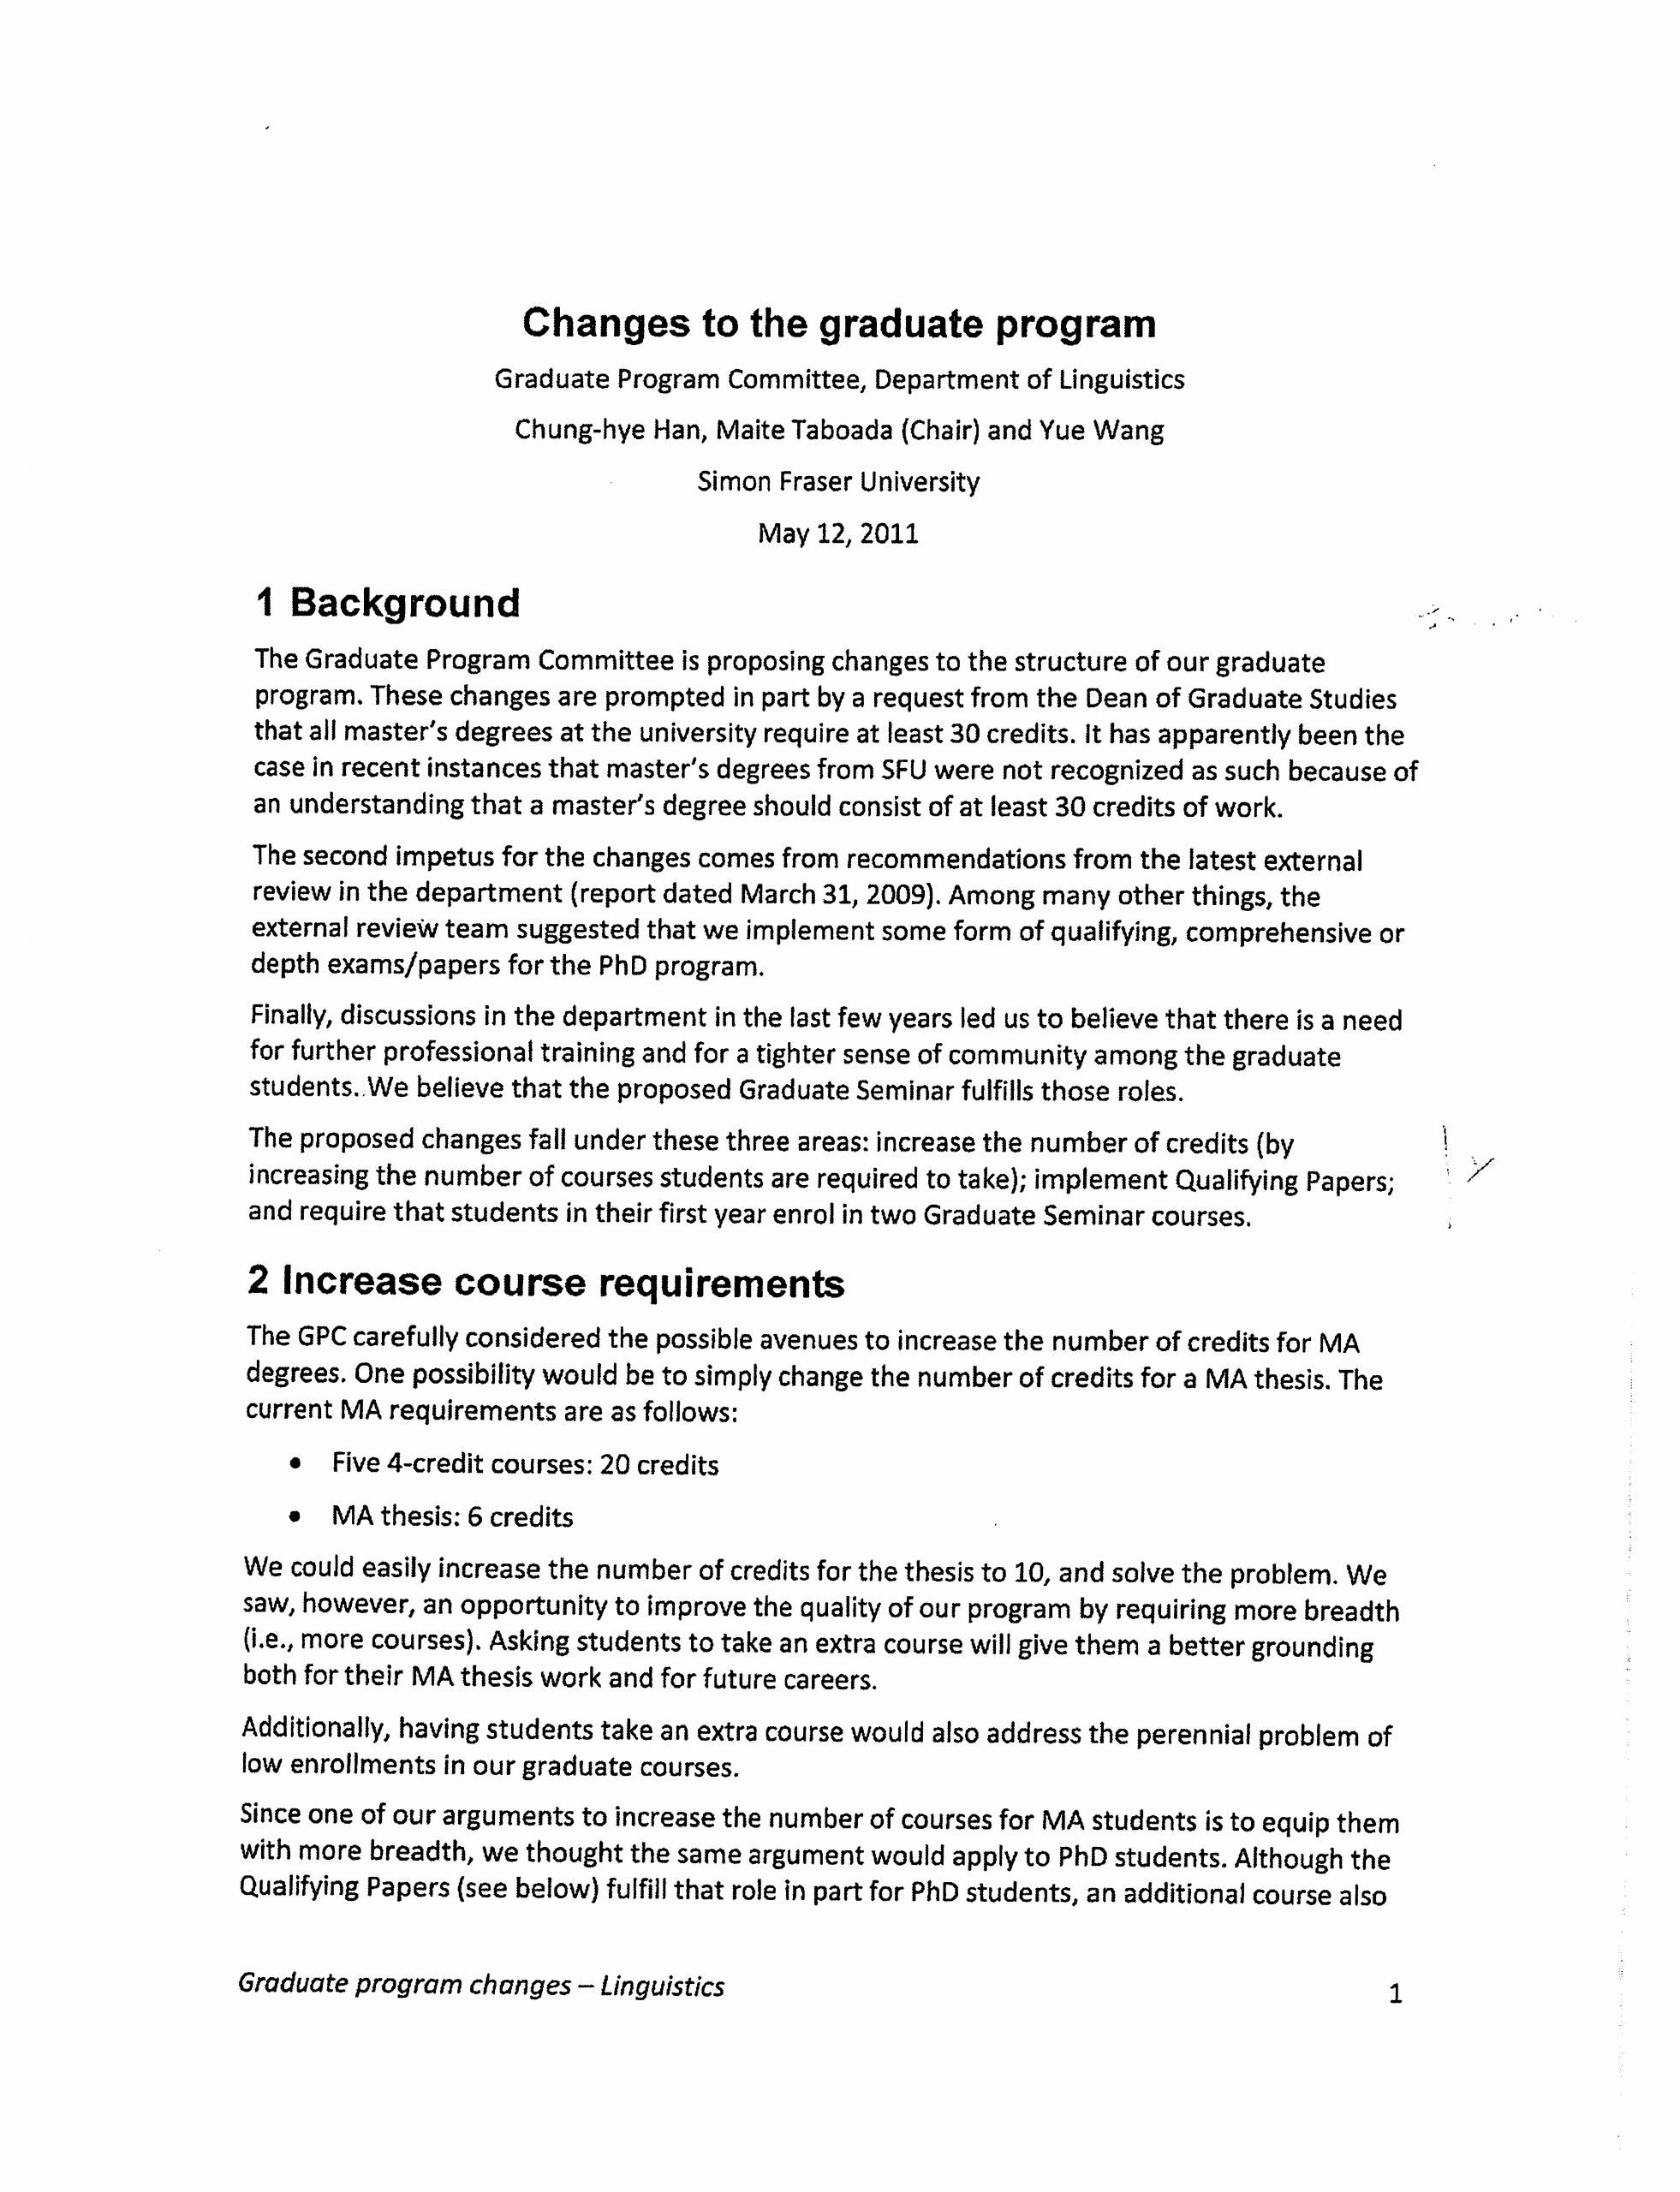 Sample Letters Of Intent Grad School Fresh Statement Of Intent Grad School Successful Sample